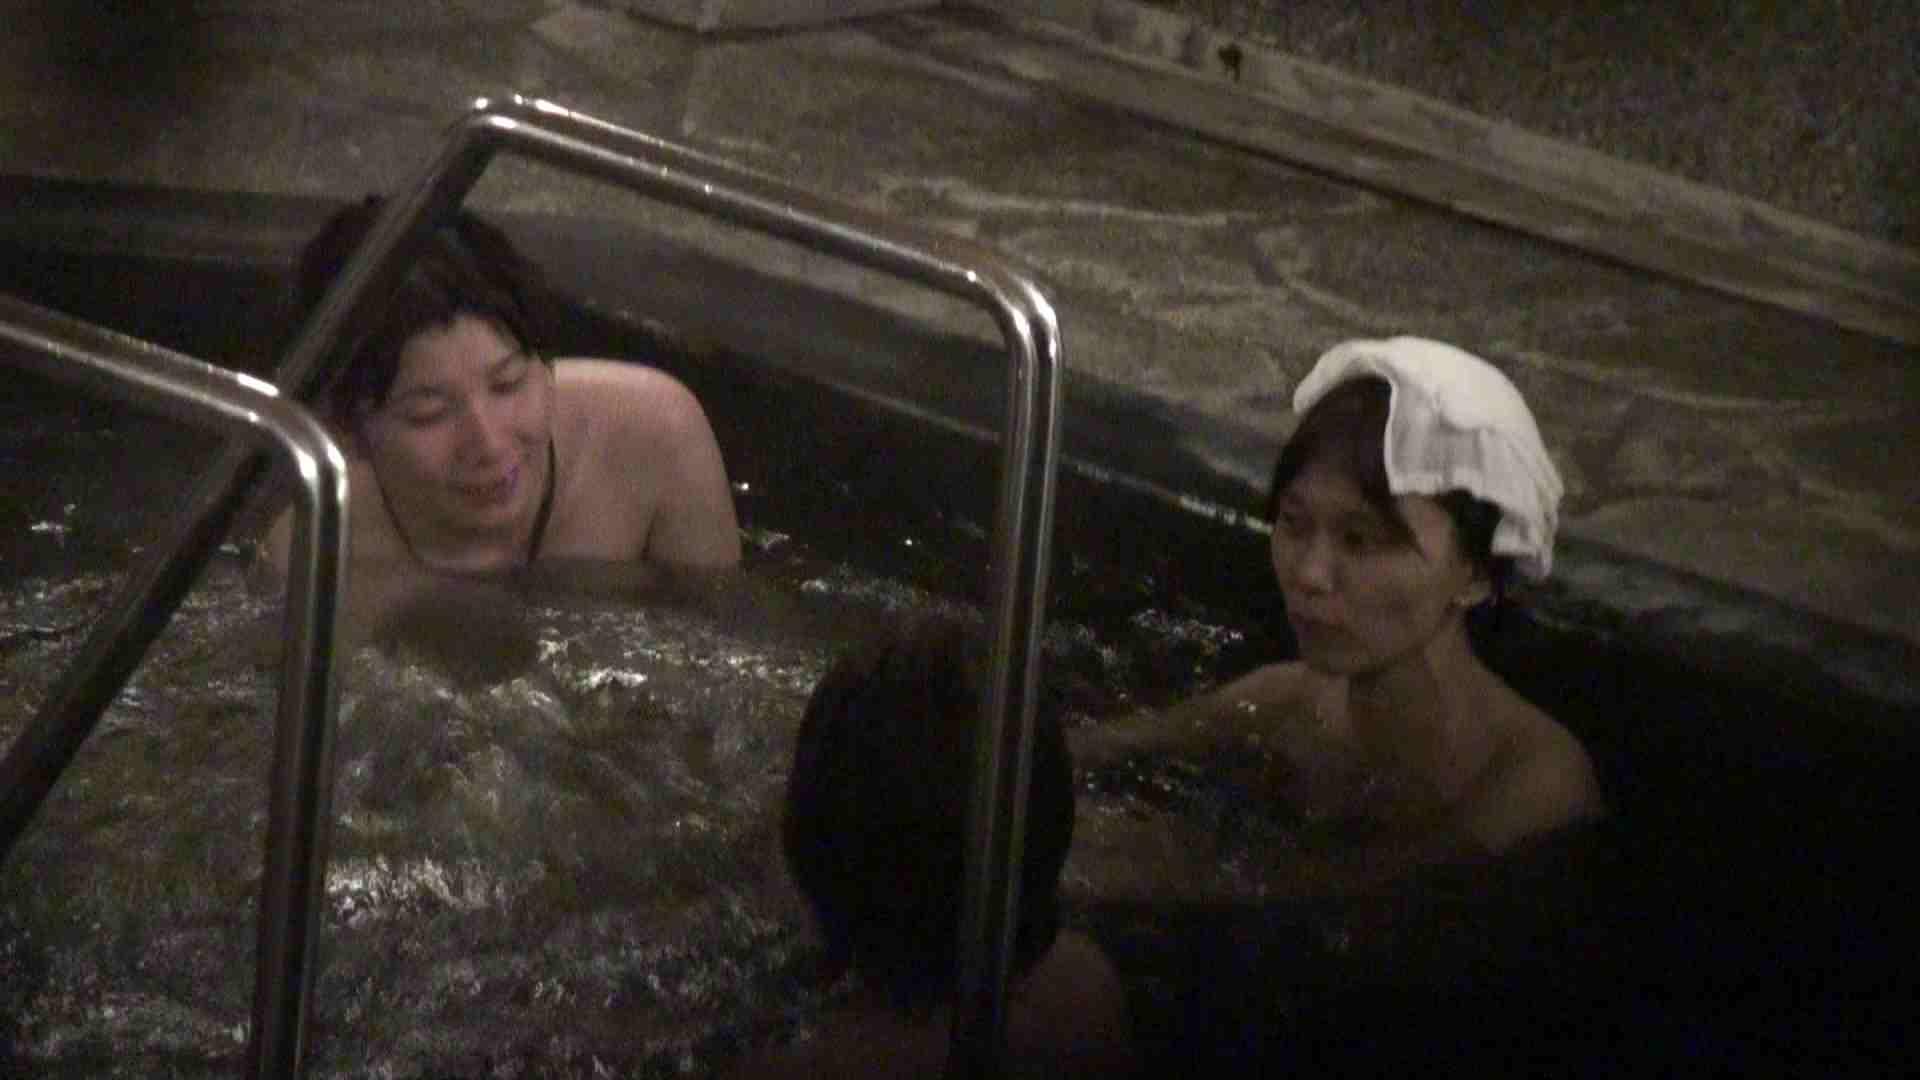 Aquaな露天風呂Vol.419 露天 覗きおまんこ画像 99画像 29